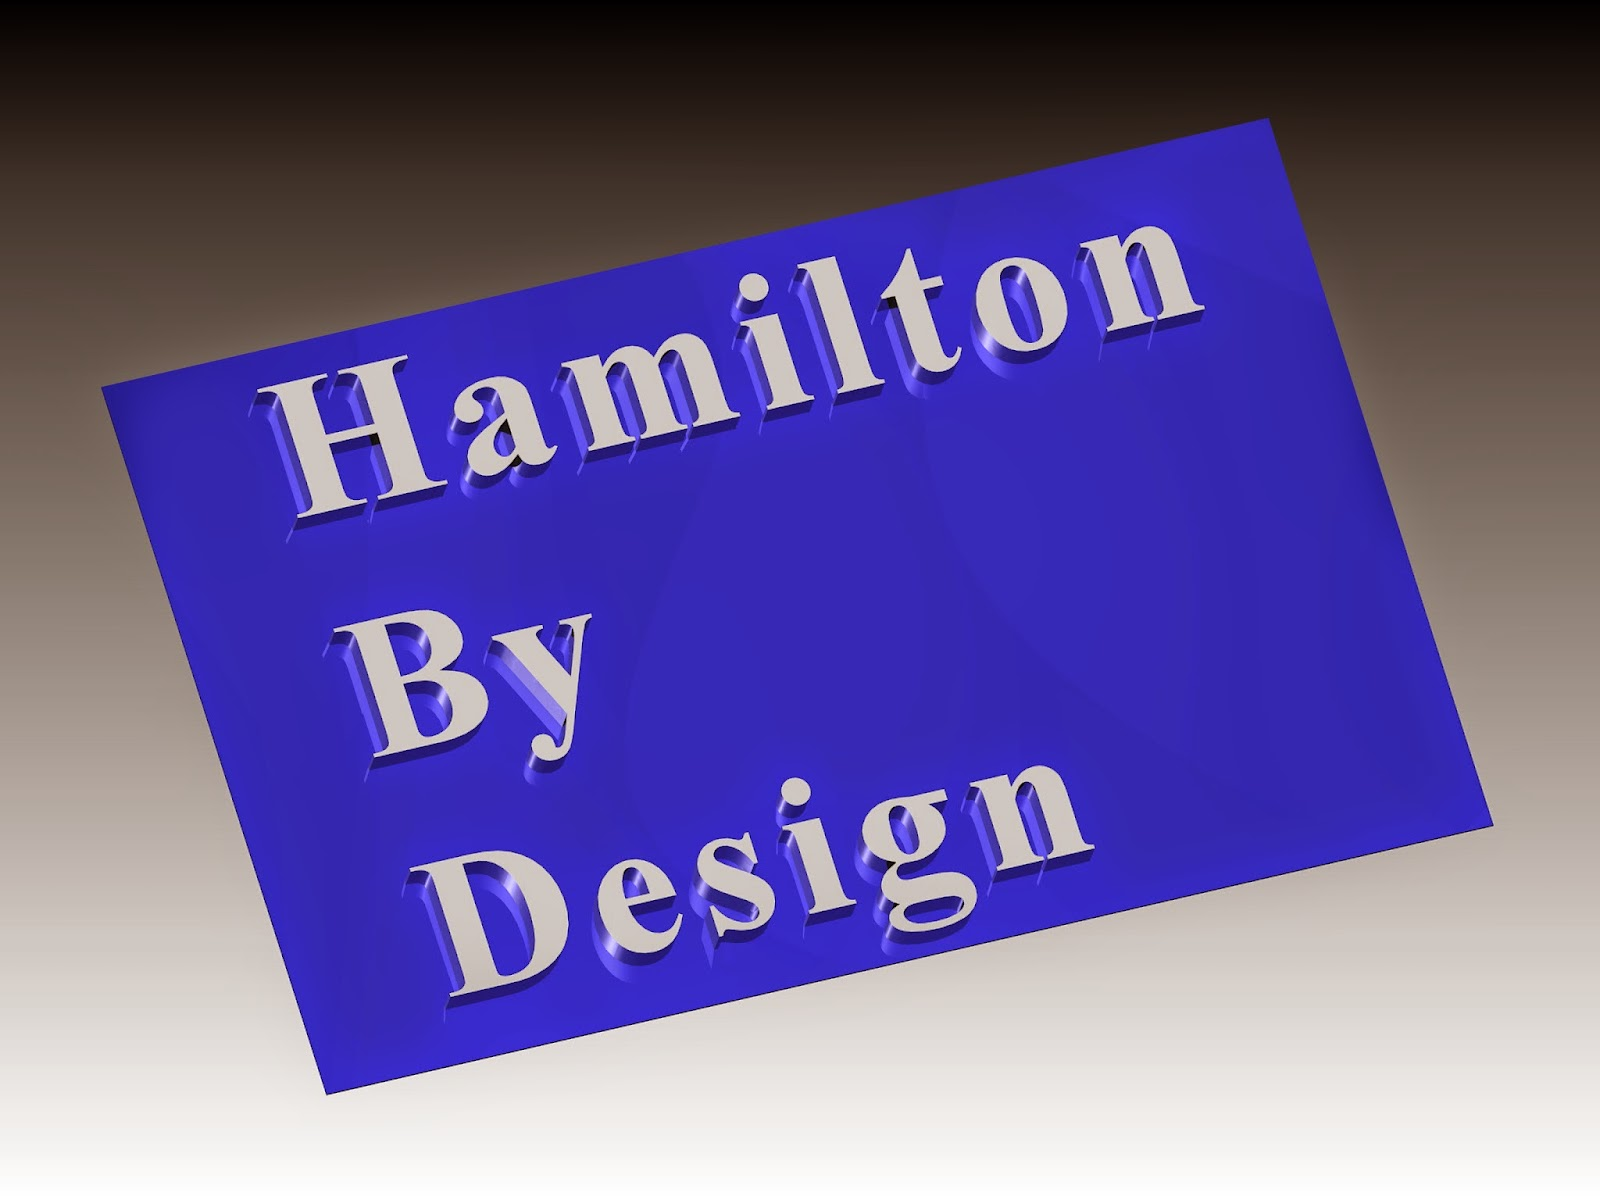 Drafting Hamilton By Design